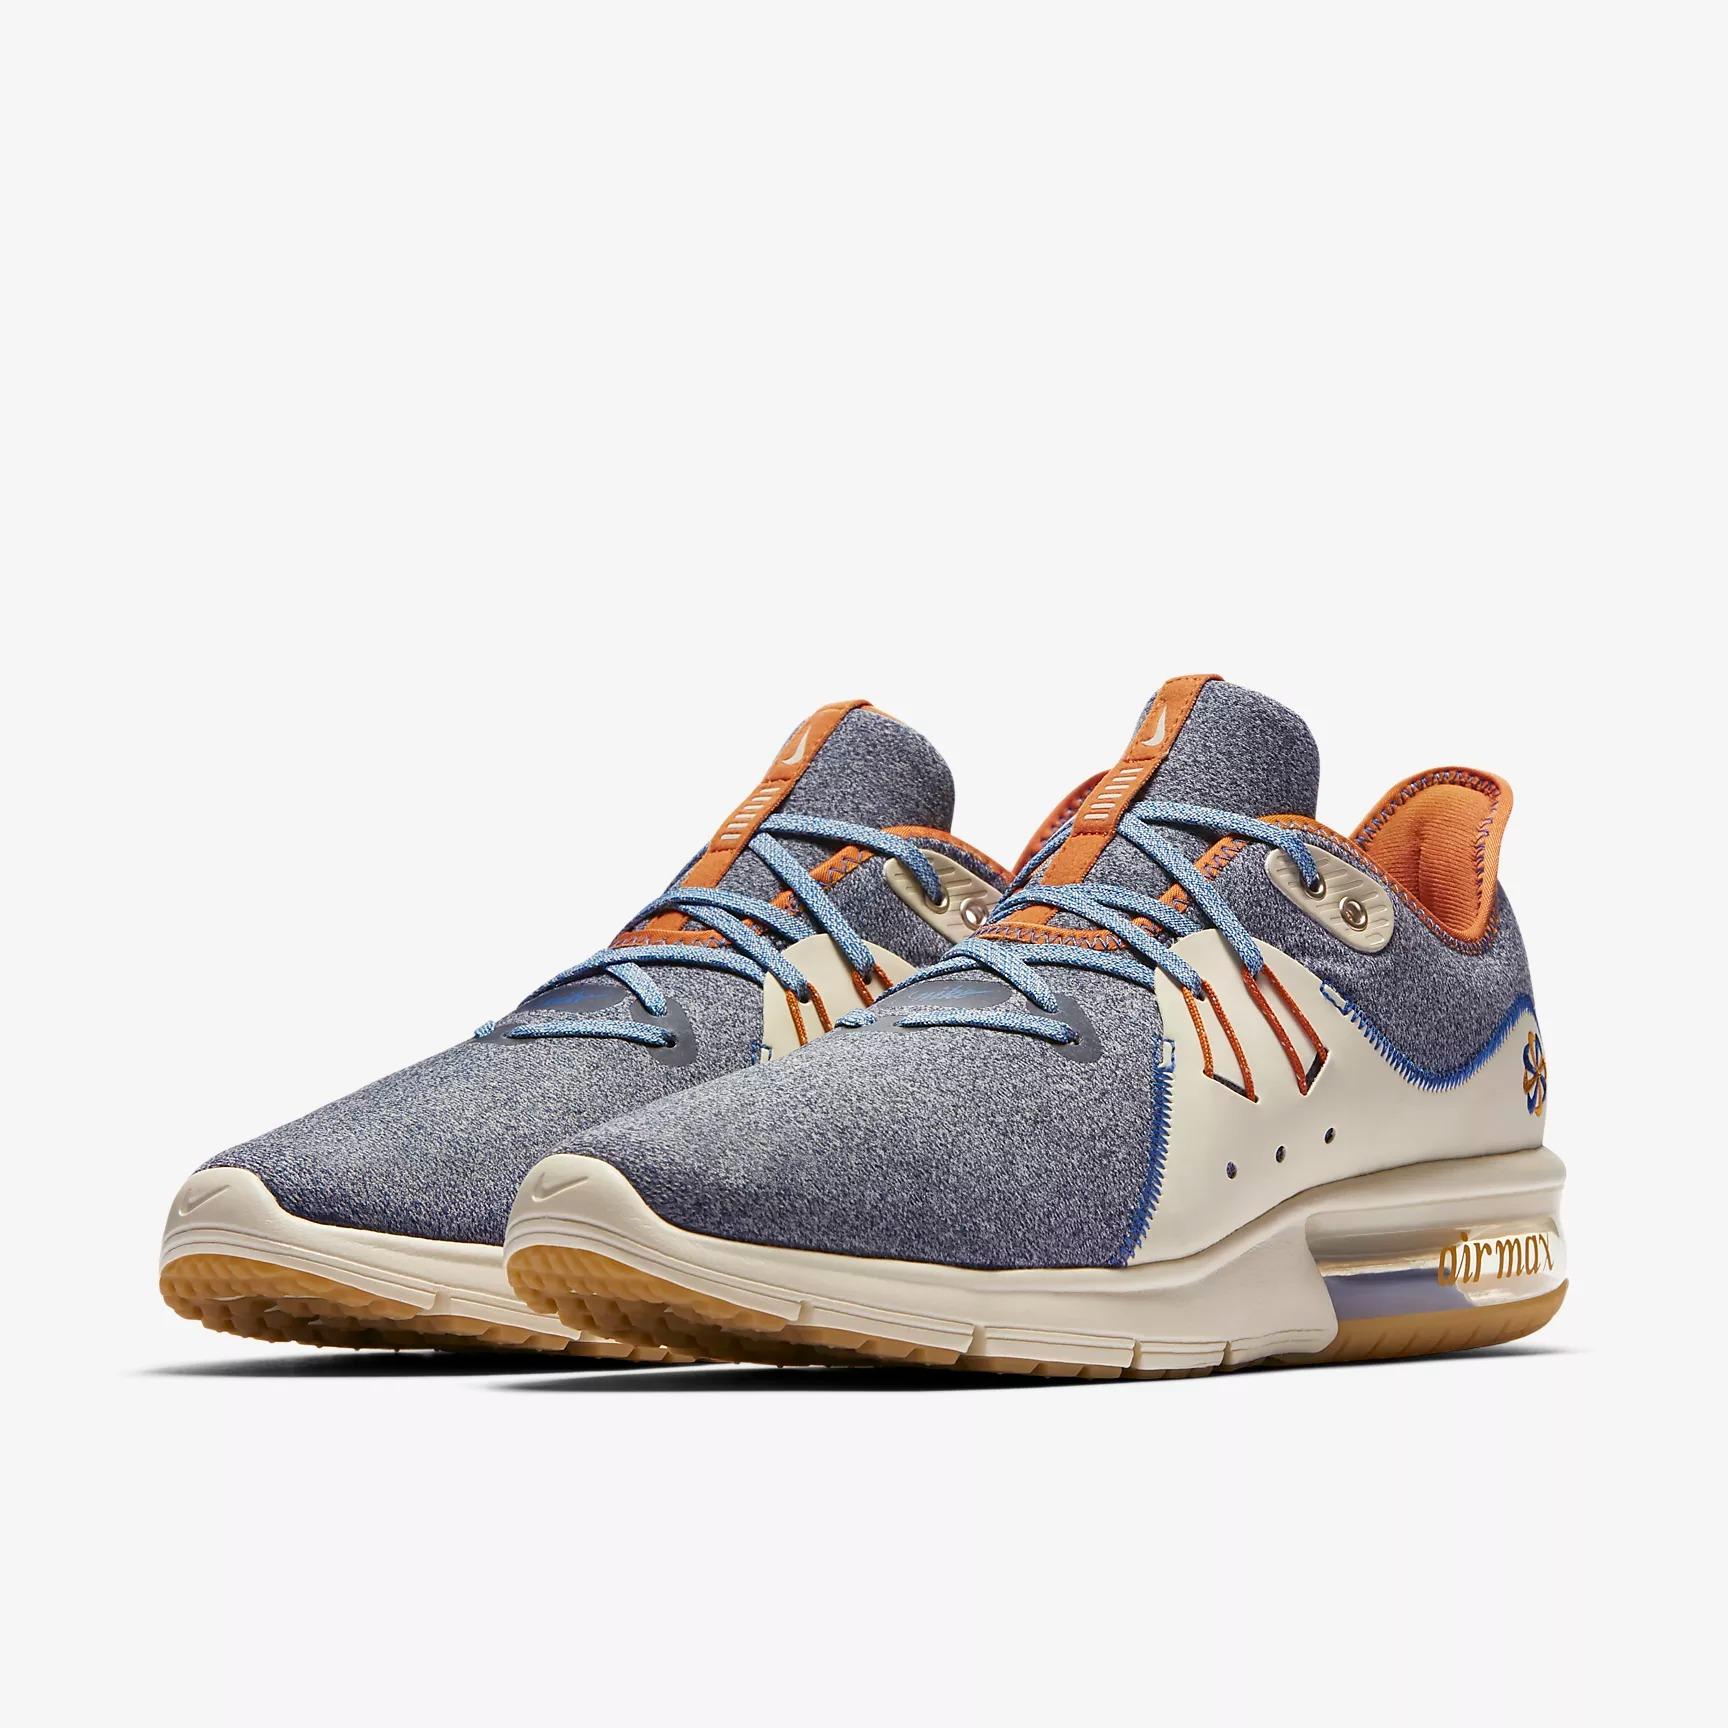 SPORT Chaussures Air Running Max Nike Premium Sequent Chaussures 3 VST 4x8nwqaC